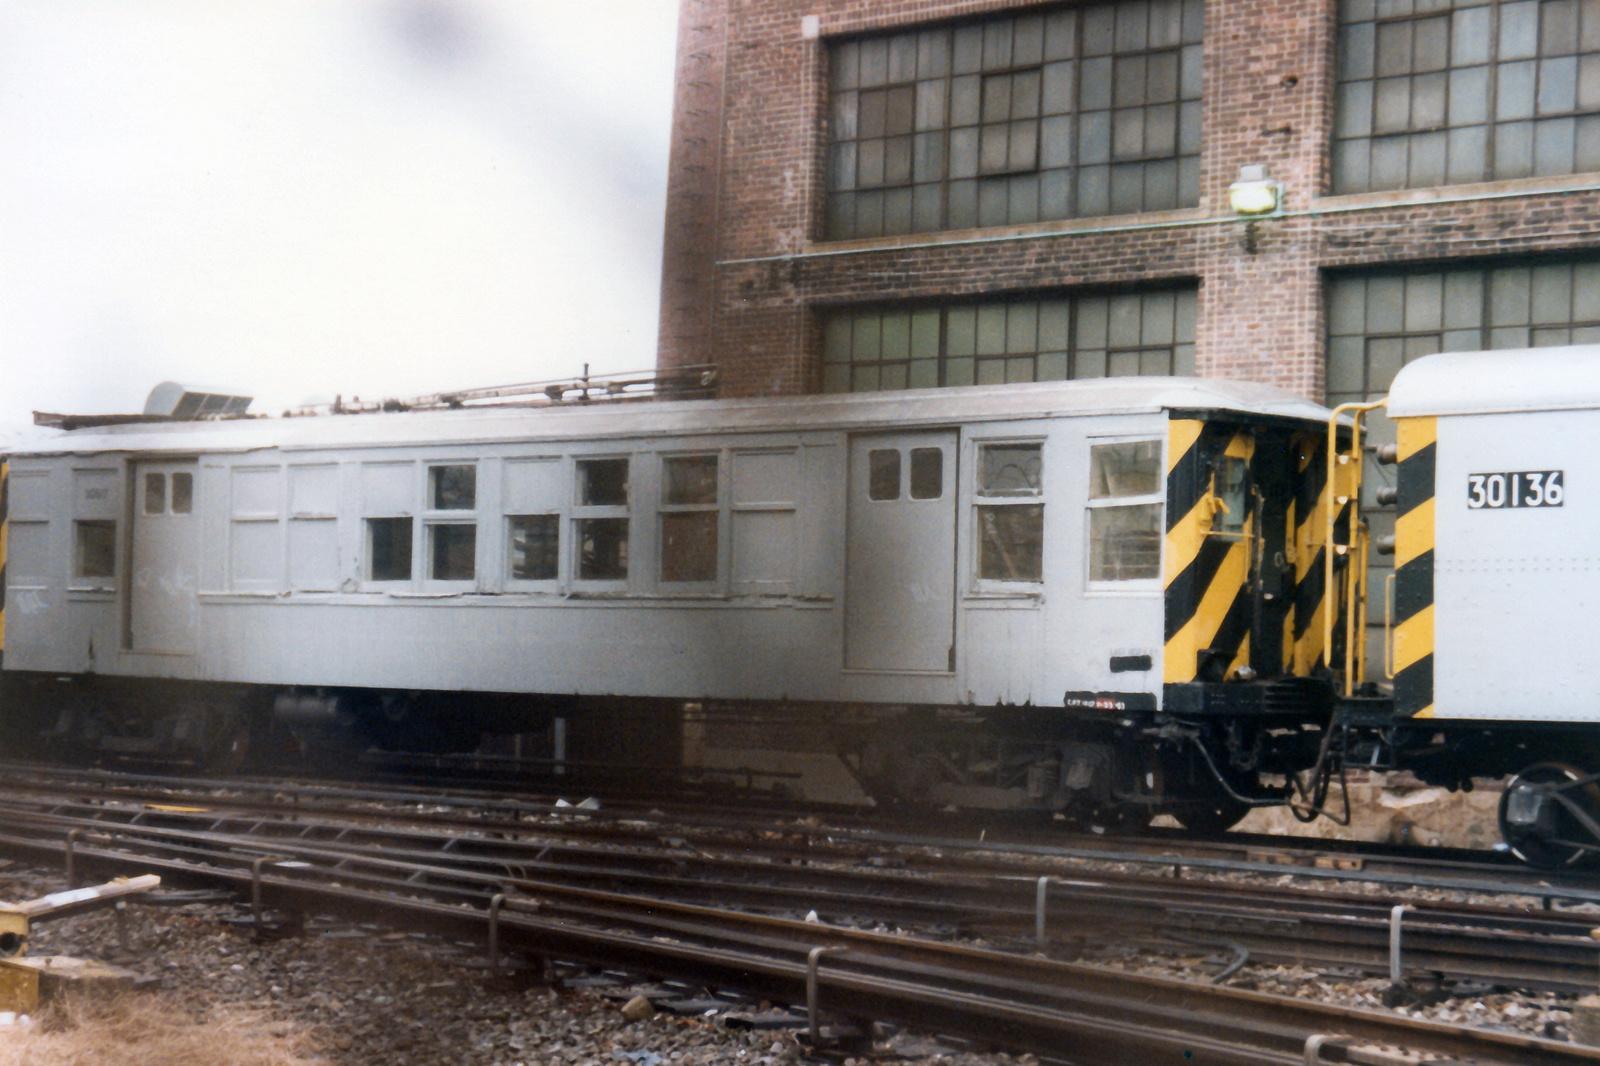 (683k, 1600x1066)<br><b>Country:</b> United States<br><b>City:</b> New York<br><b>System:</b> New York City Transit<br><b>Location:</b> Coney Island Yard<br><b>Car:</b> BMT Q 30617 (ex-1630)<br><b>Collection of:</b> Nicholas Fabrizio<br><b>Notes:</b> Pump train - hose car.<br><b>Viewed (this week/total):</b> 1 / 167